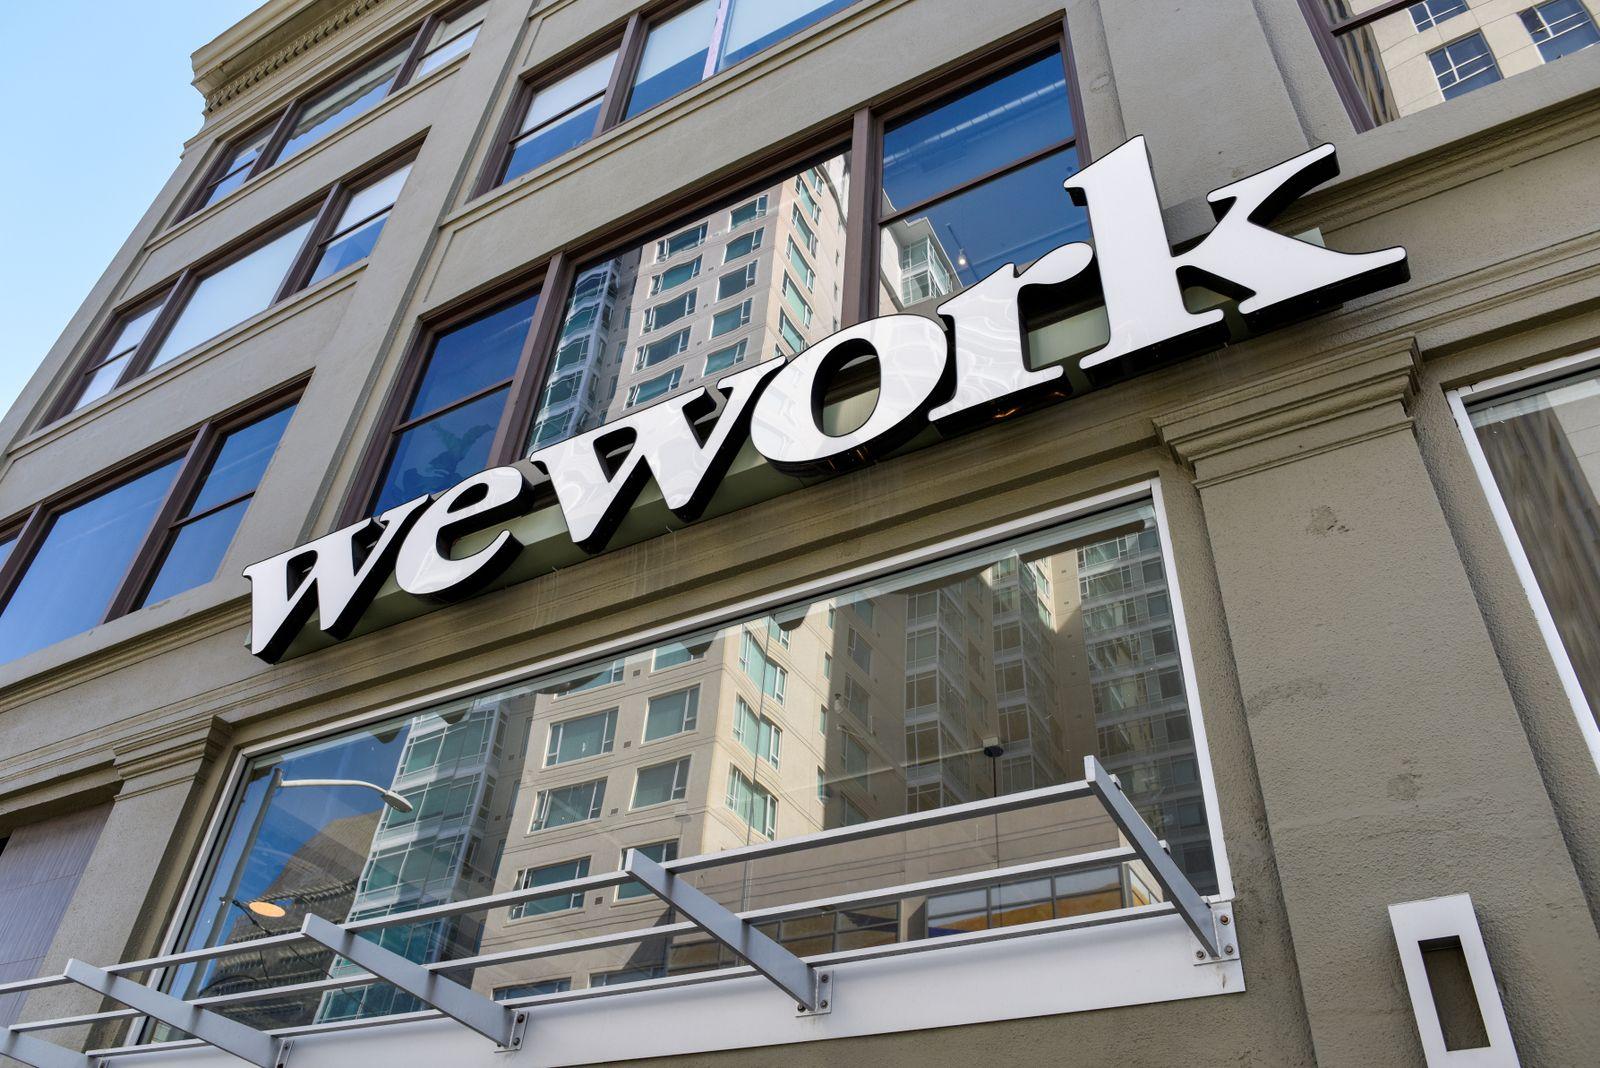 WEWORK-FINANCING/SOFTBANK GROUP